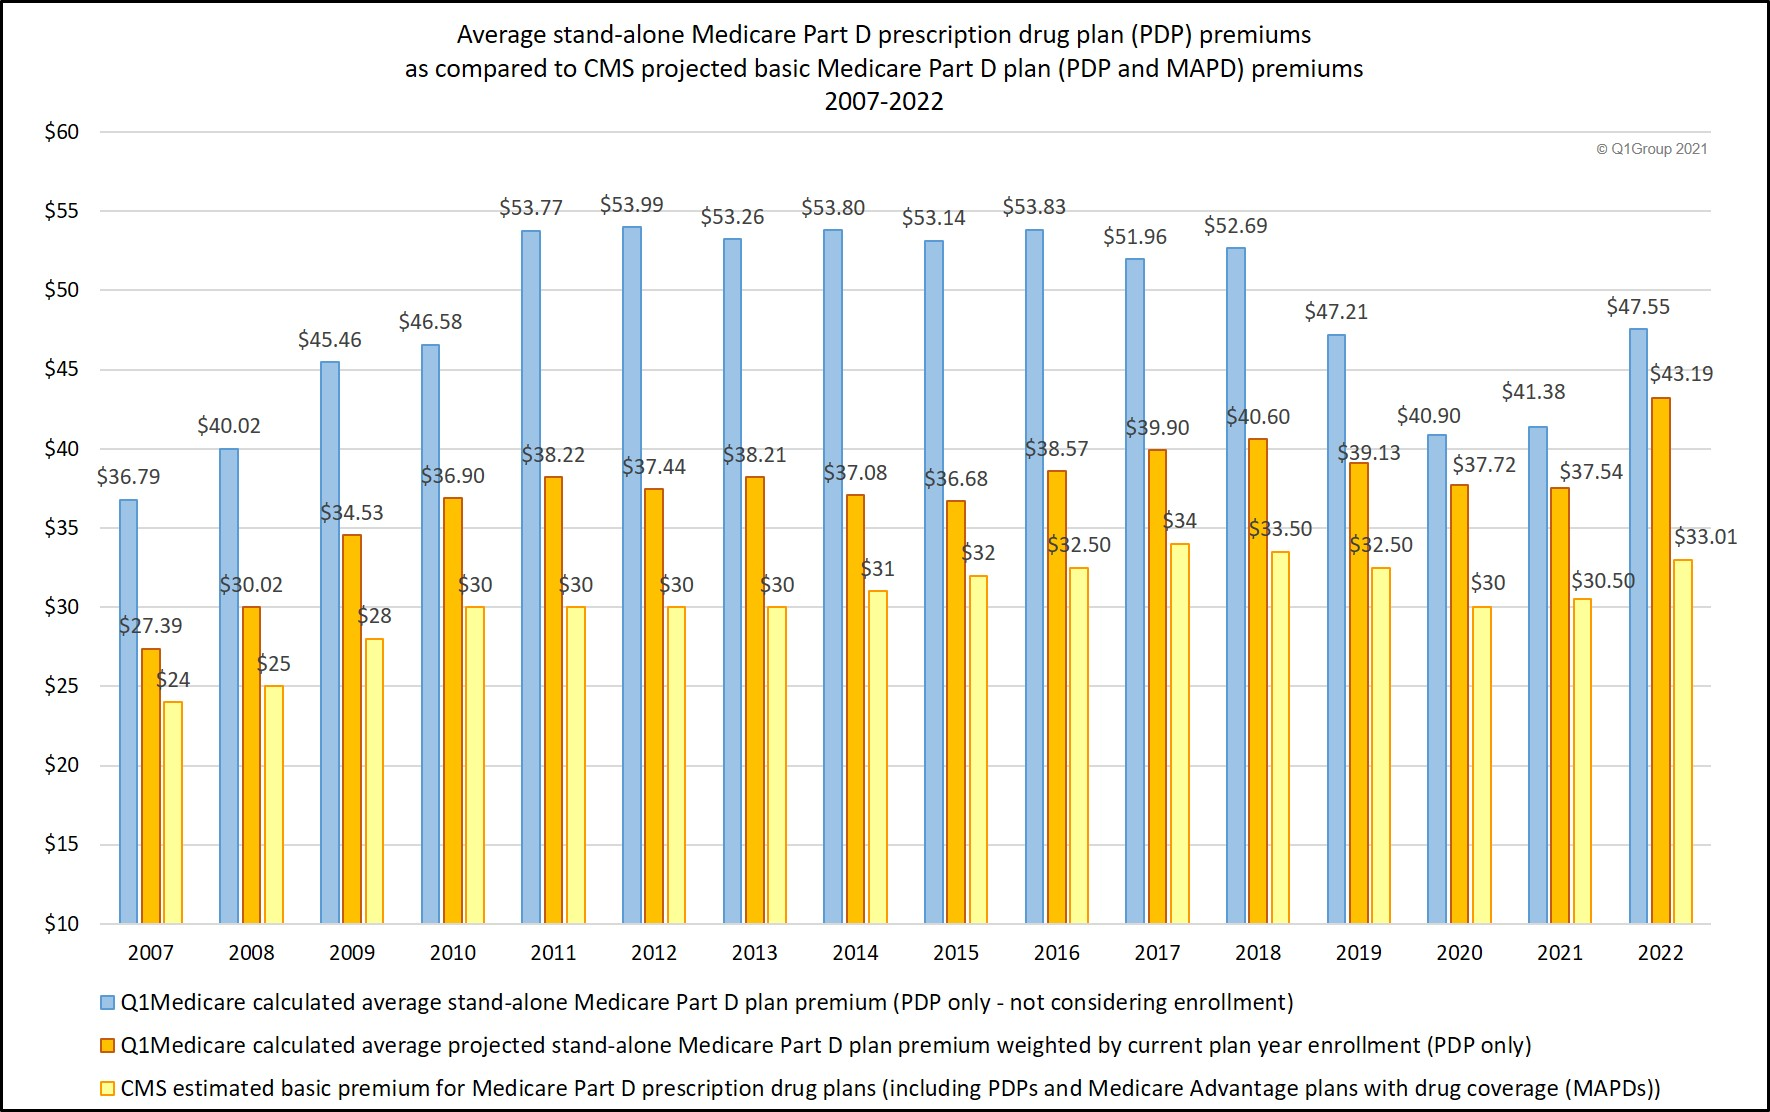 Estimated premium vs actual and weighted premiums